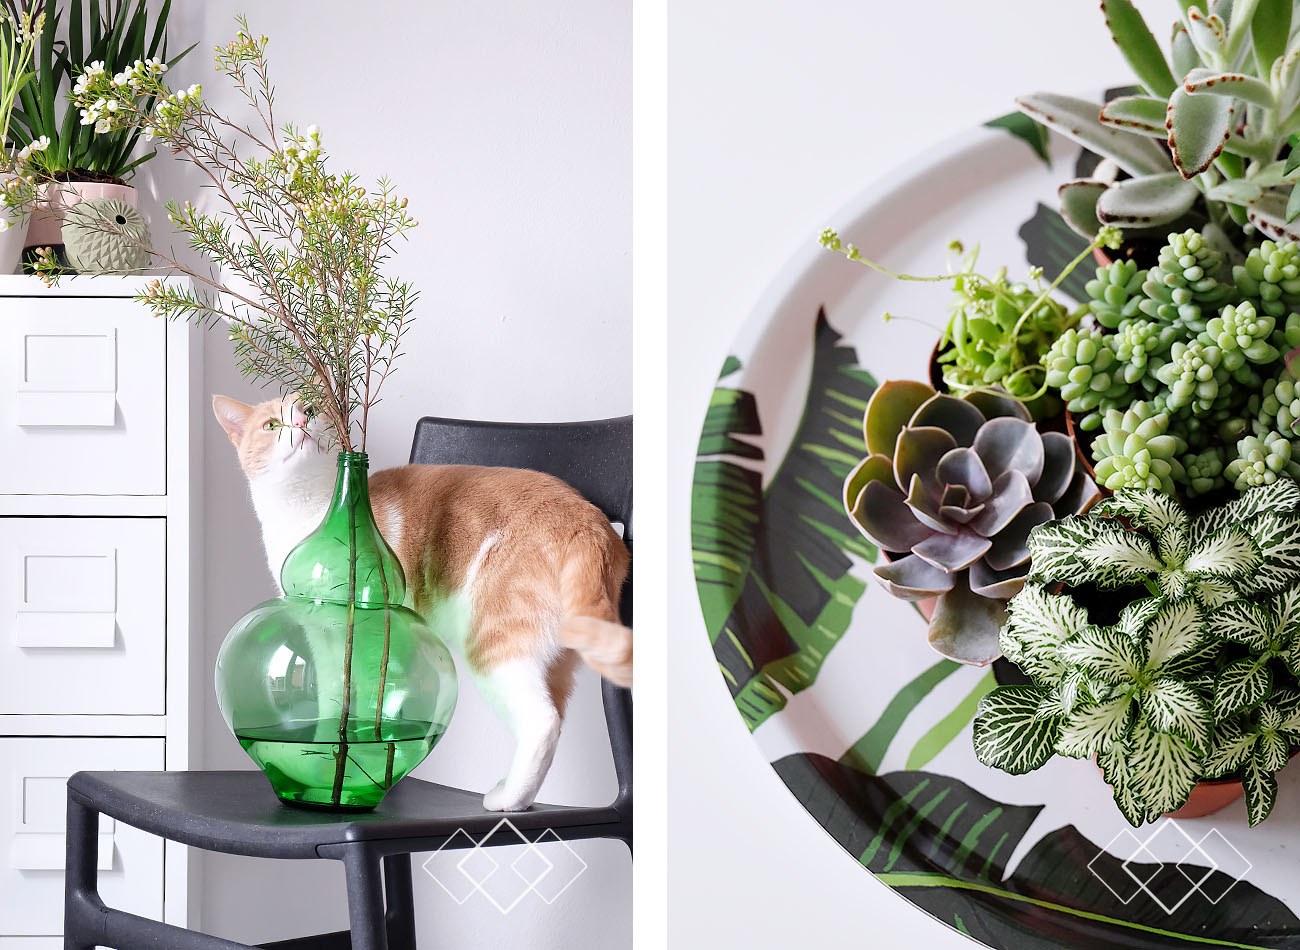 Plantjes 1 - staand